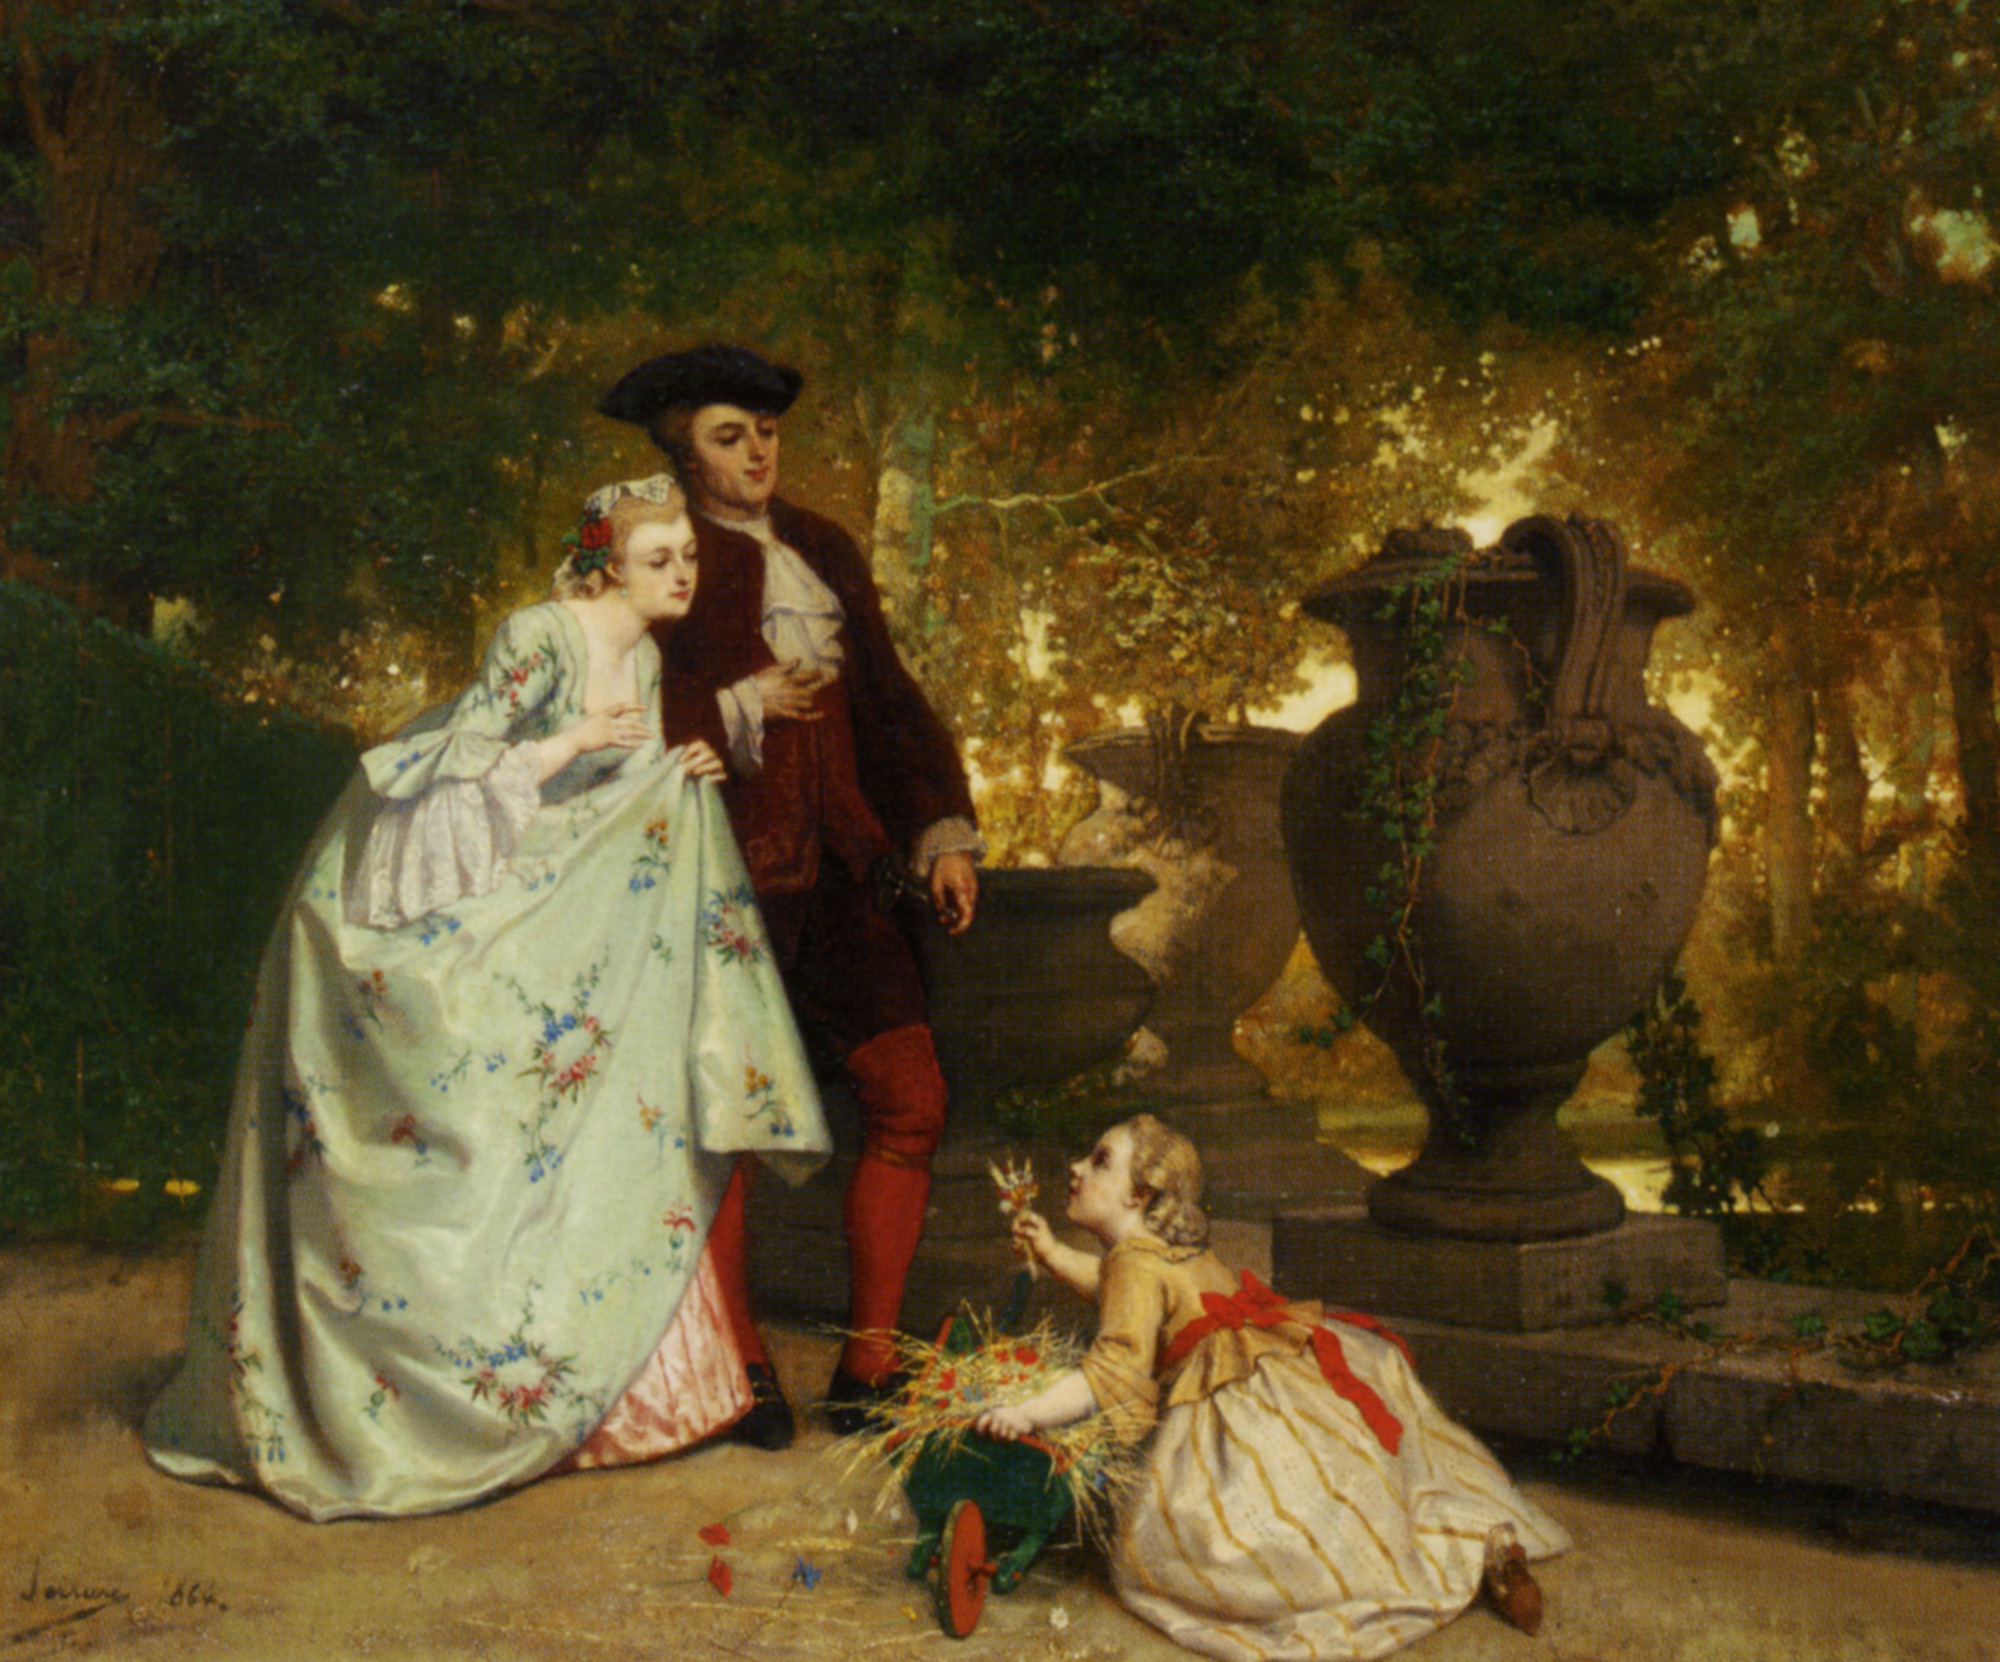 Seller The Little Flower :: Auguste Serrure - Romantic scenes in art and painting ôîòî